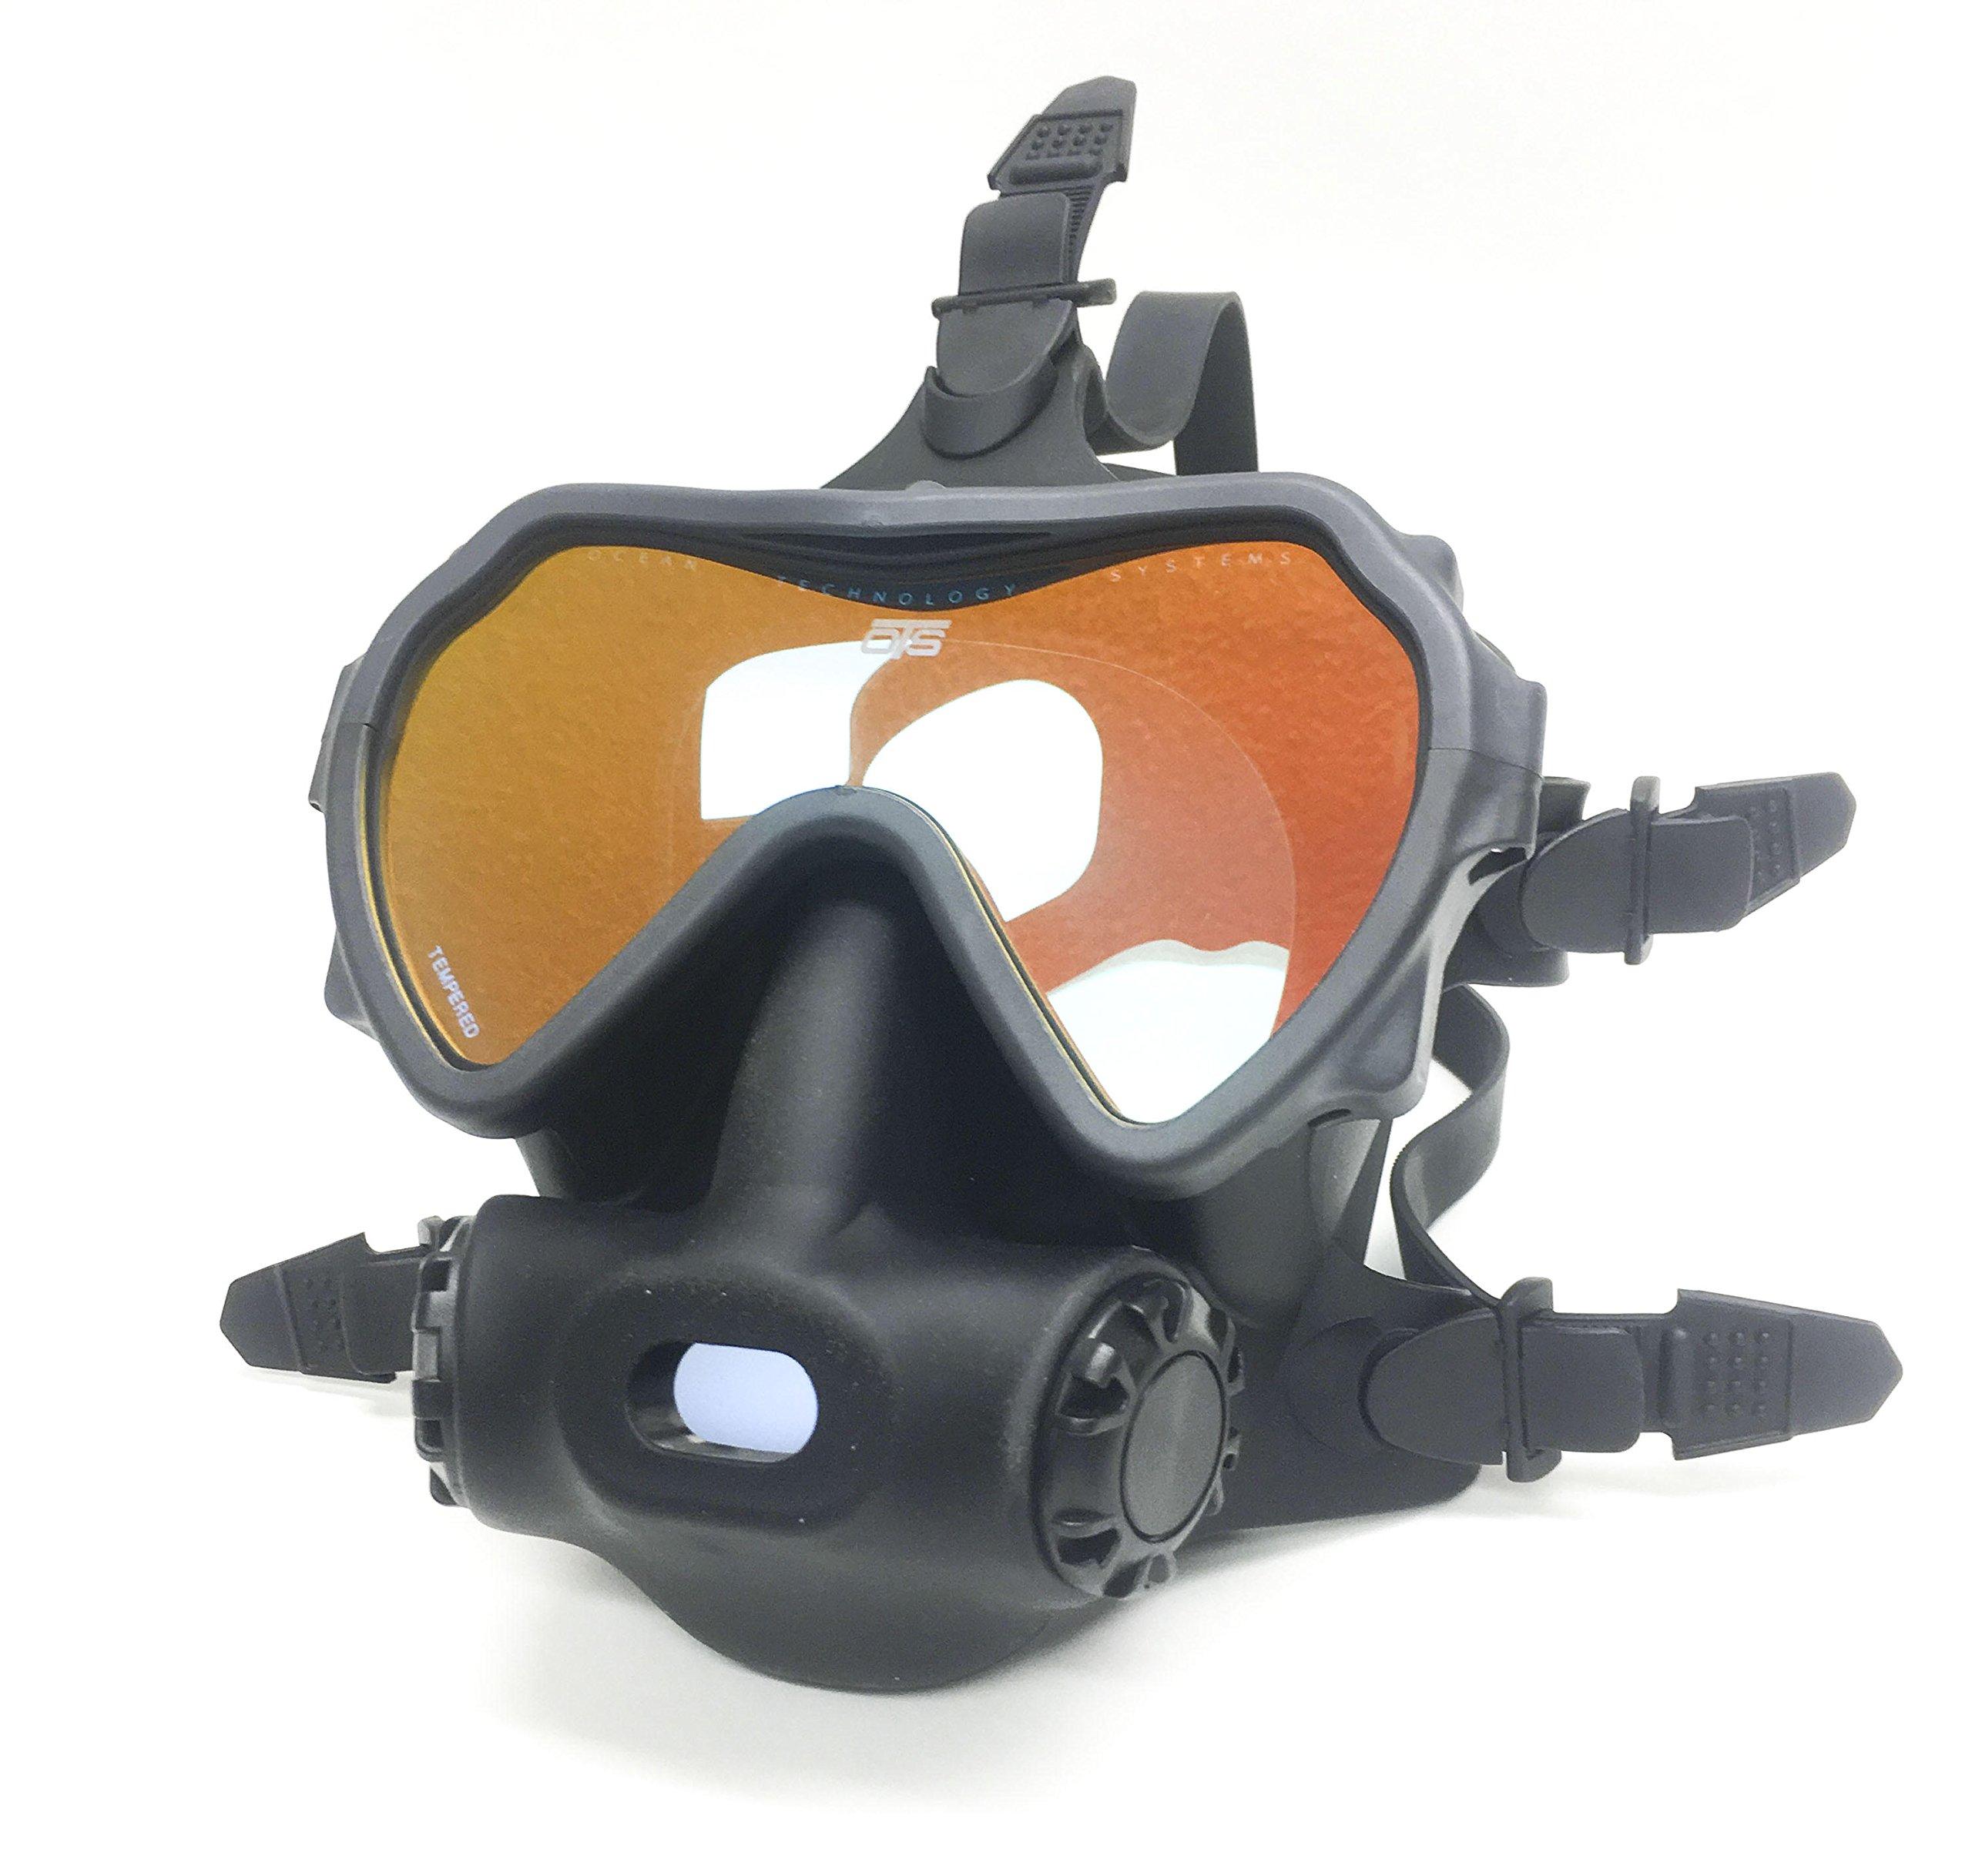 OTS Spectrum Full Face Mask, Black Tinted Lens by OTS